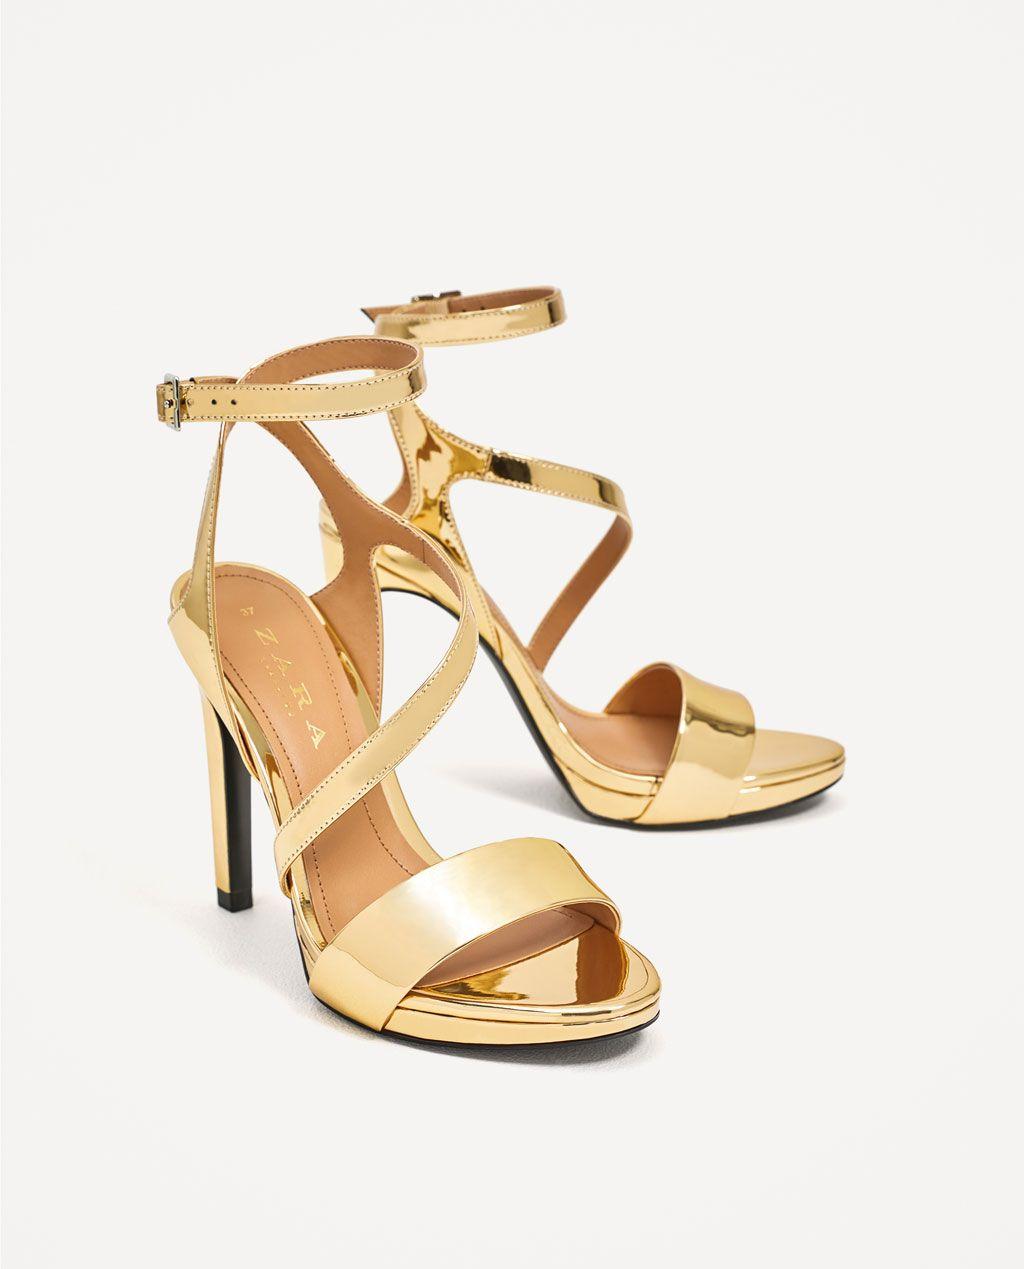 METALLIC HIGH HEEL SANDALS Heeled sandalsSHOESWOMAN Gold High Heel SandalsMetallic High HeelsAnkle Strap